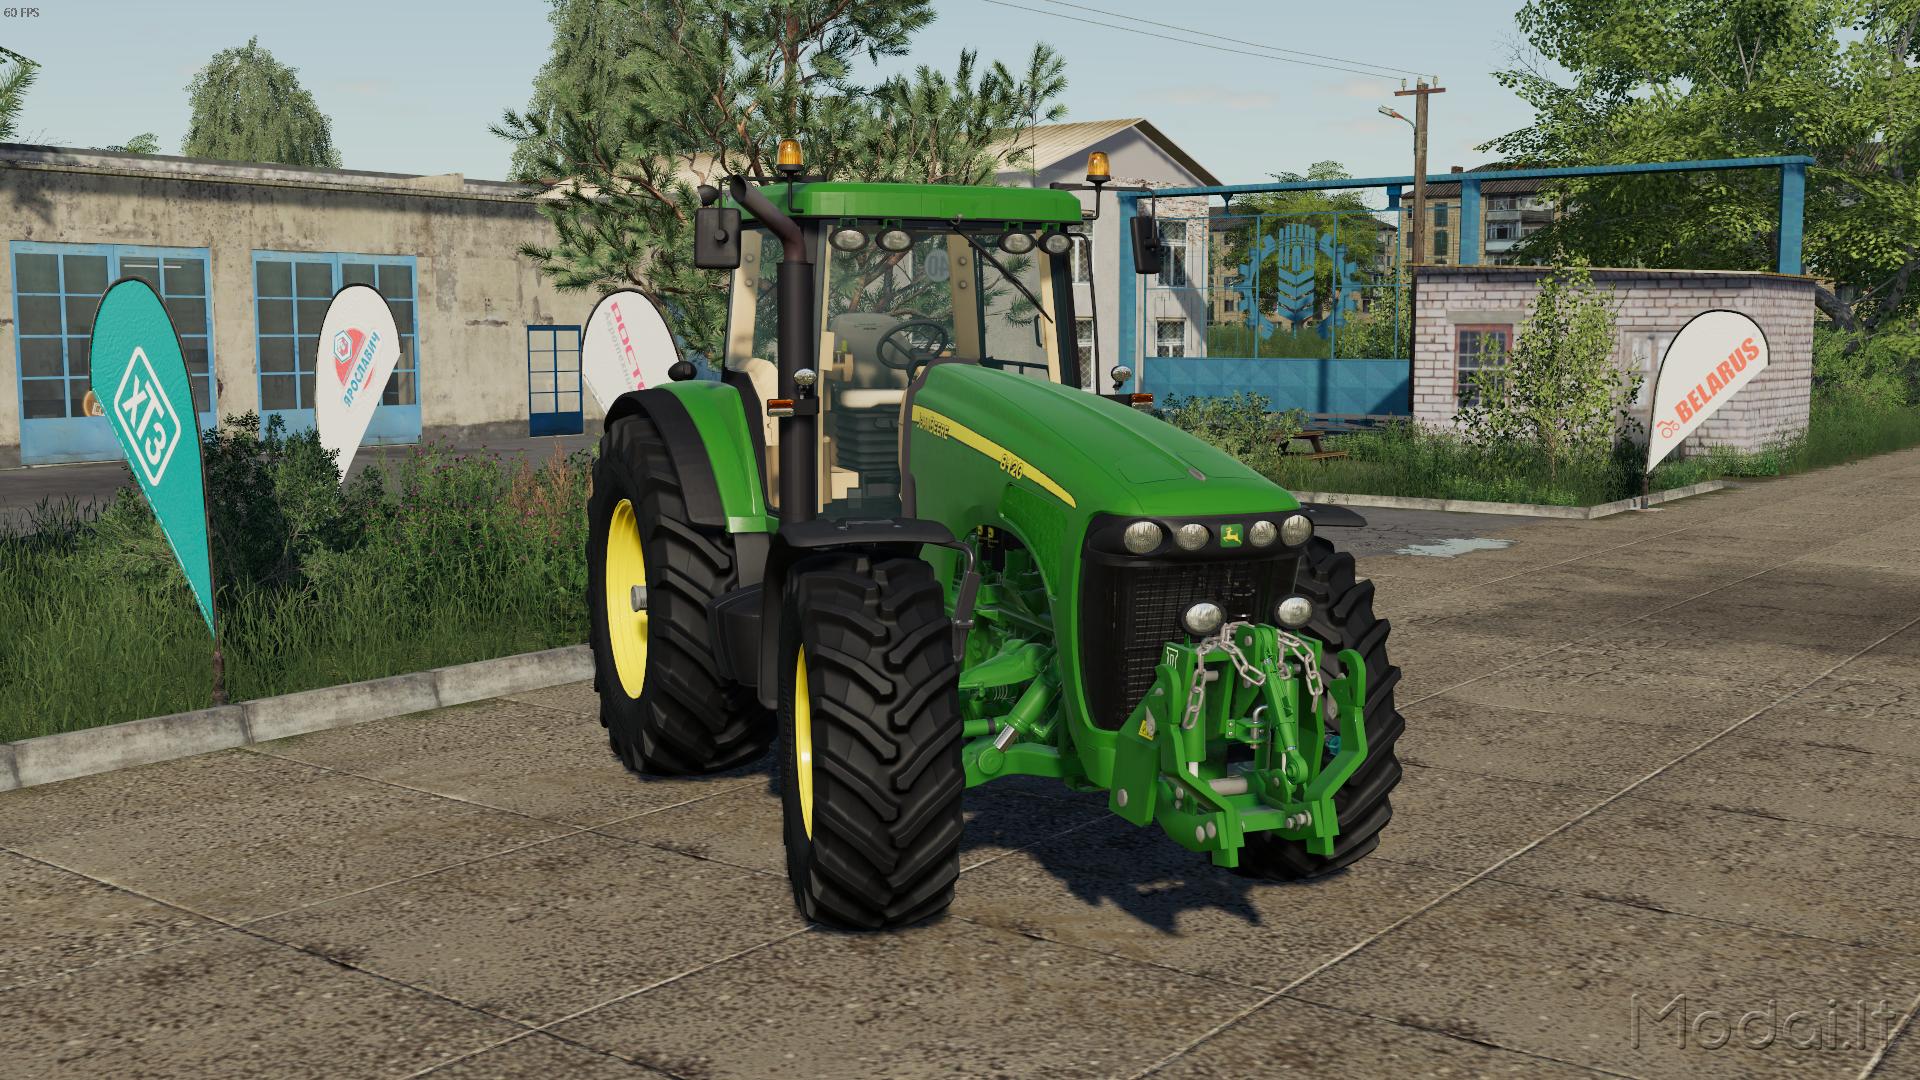 JOHN DEERE 8020 SERIES V1 0 » Modai lt - Farming simulator